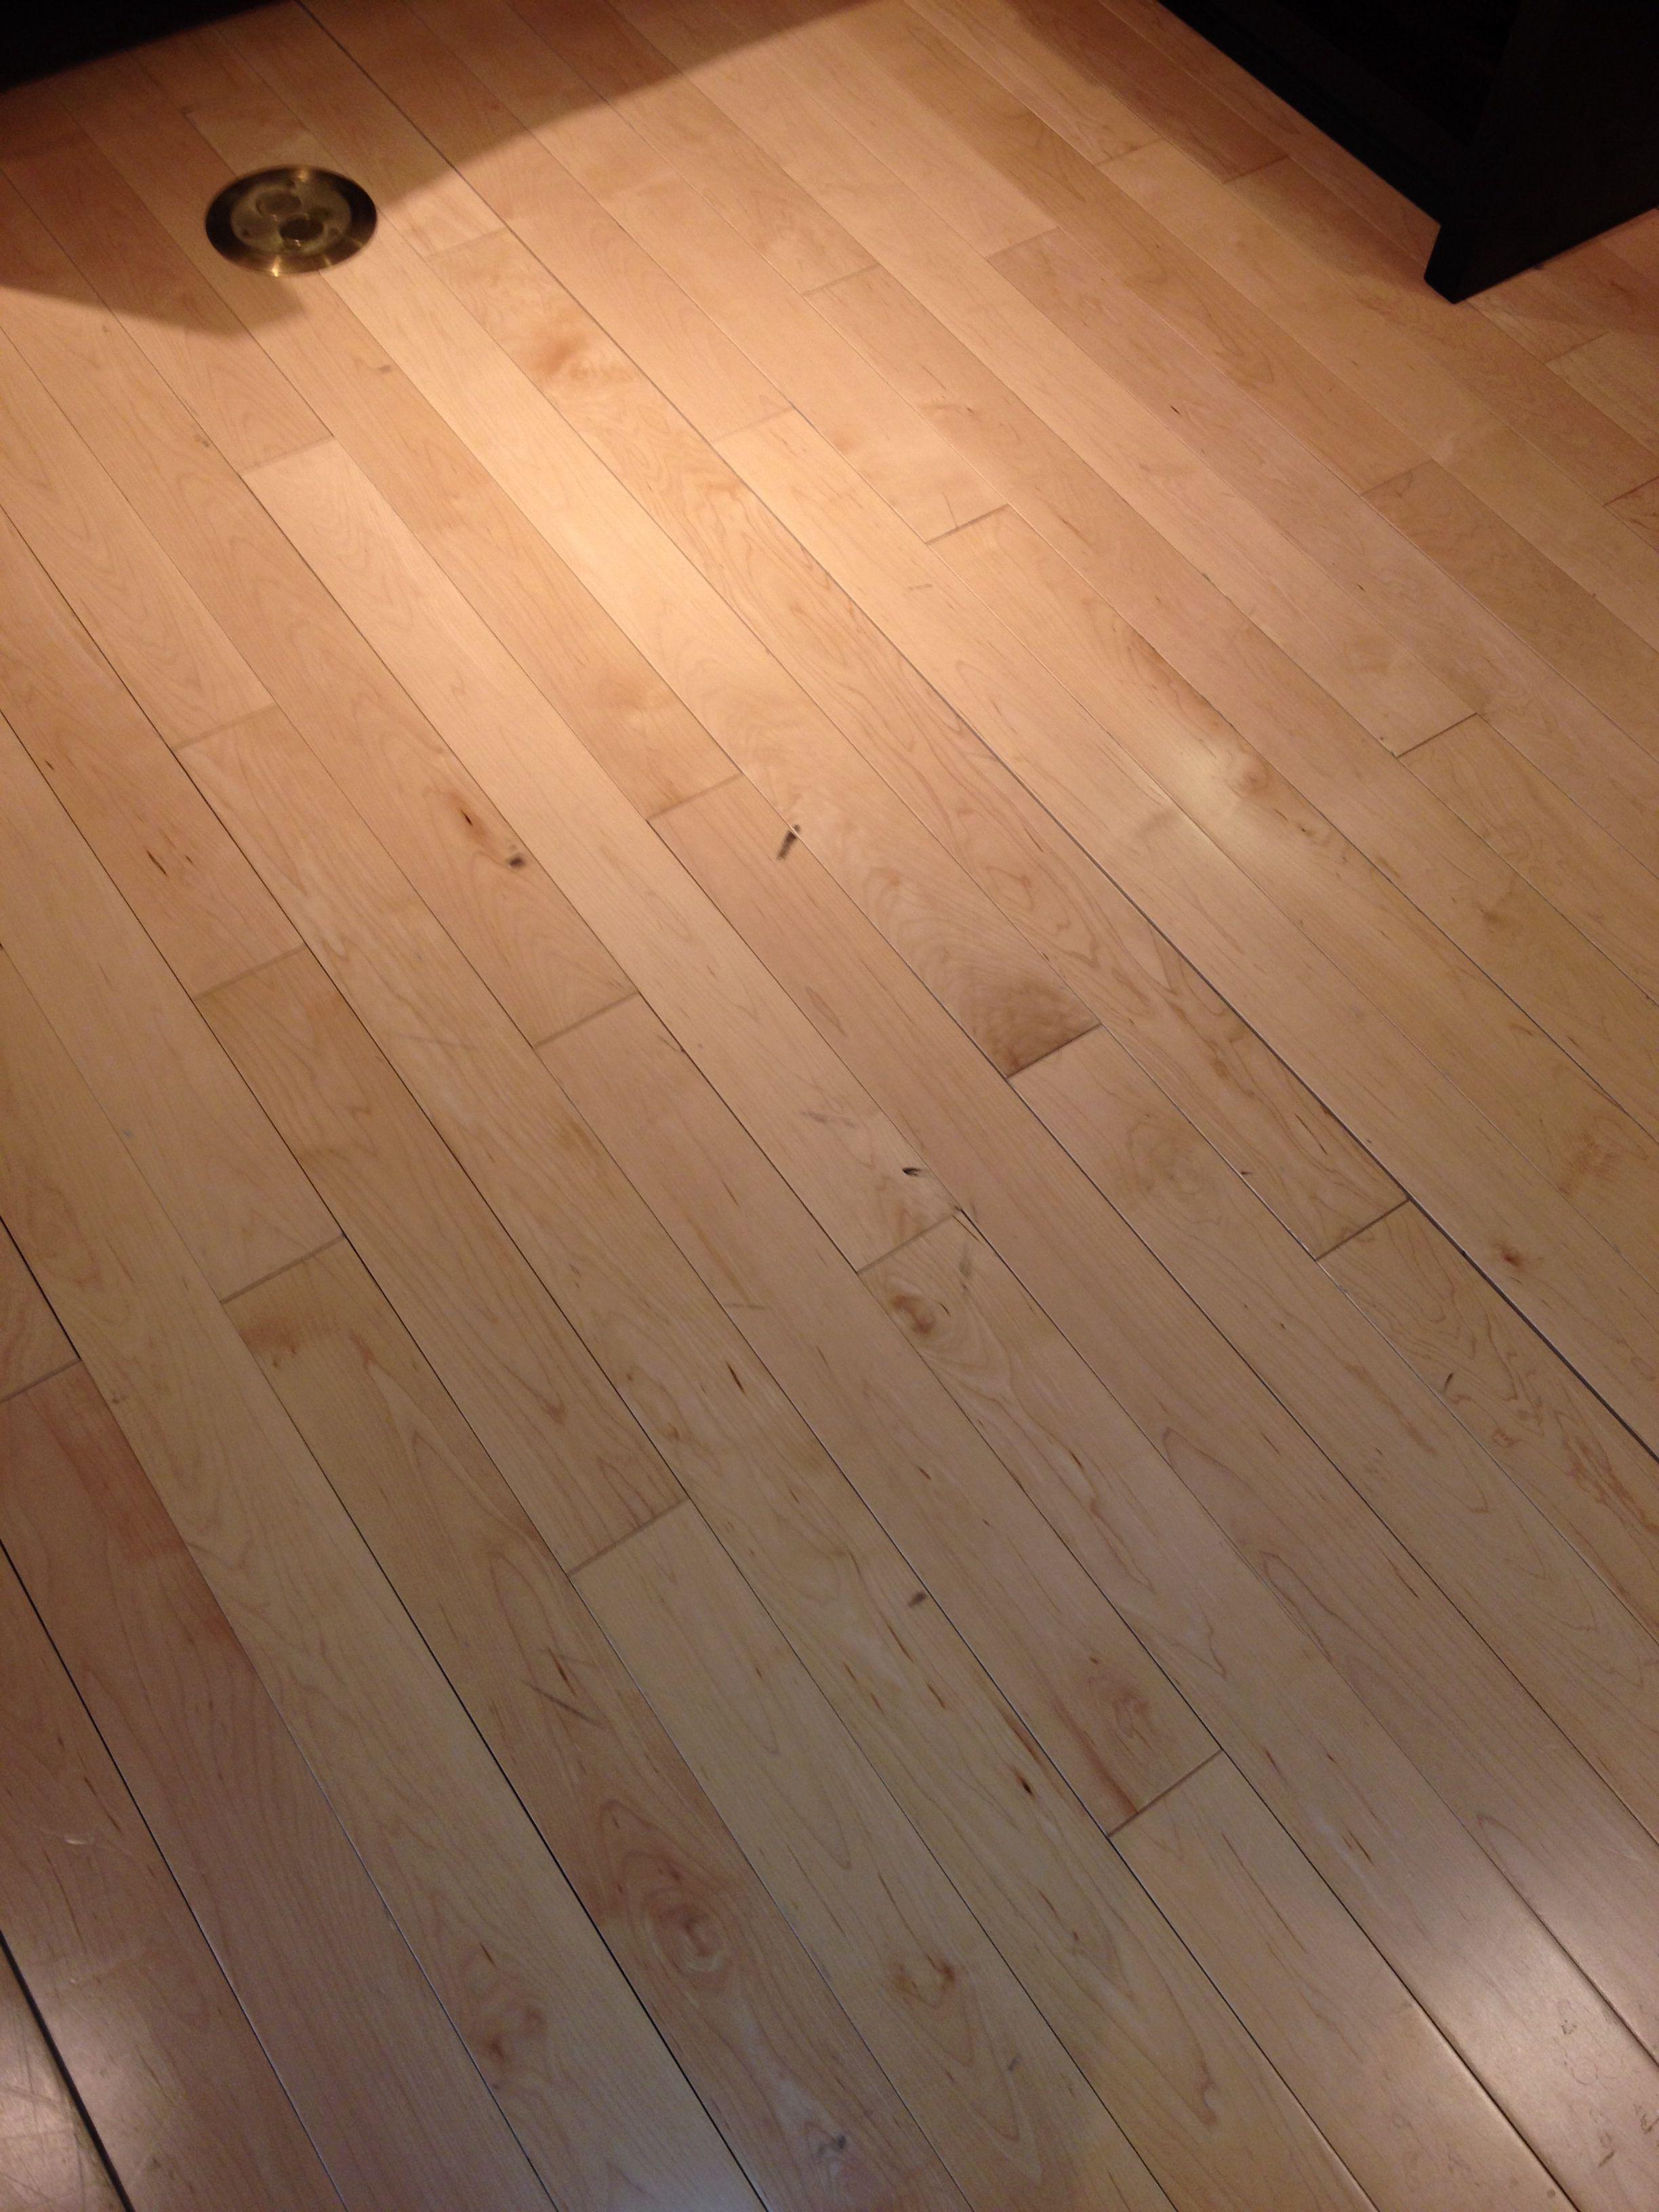 maple hardwood floor stain colors of maple wood floors retail design sketch rendering pinterest for maple wood floors